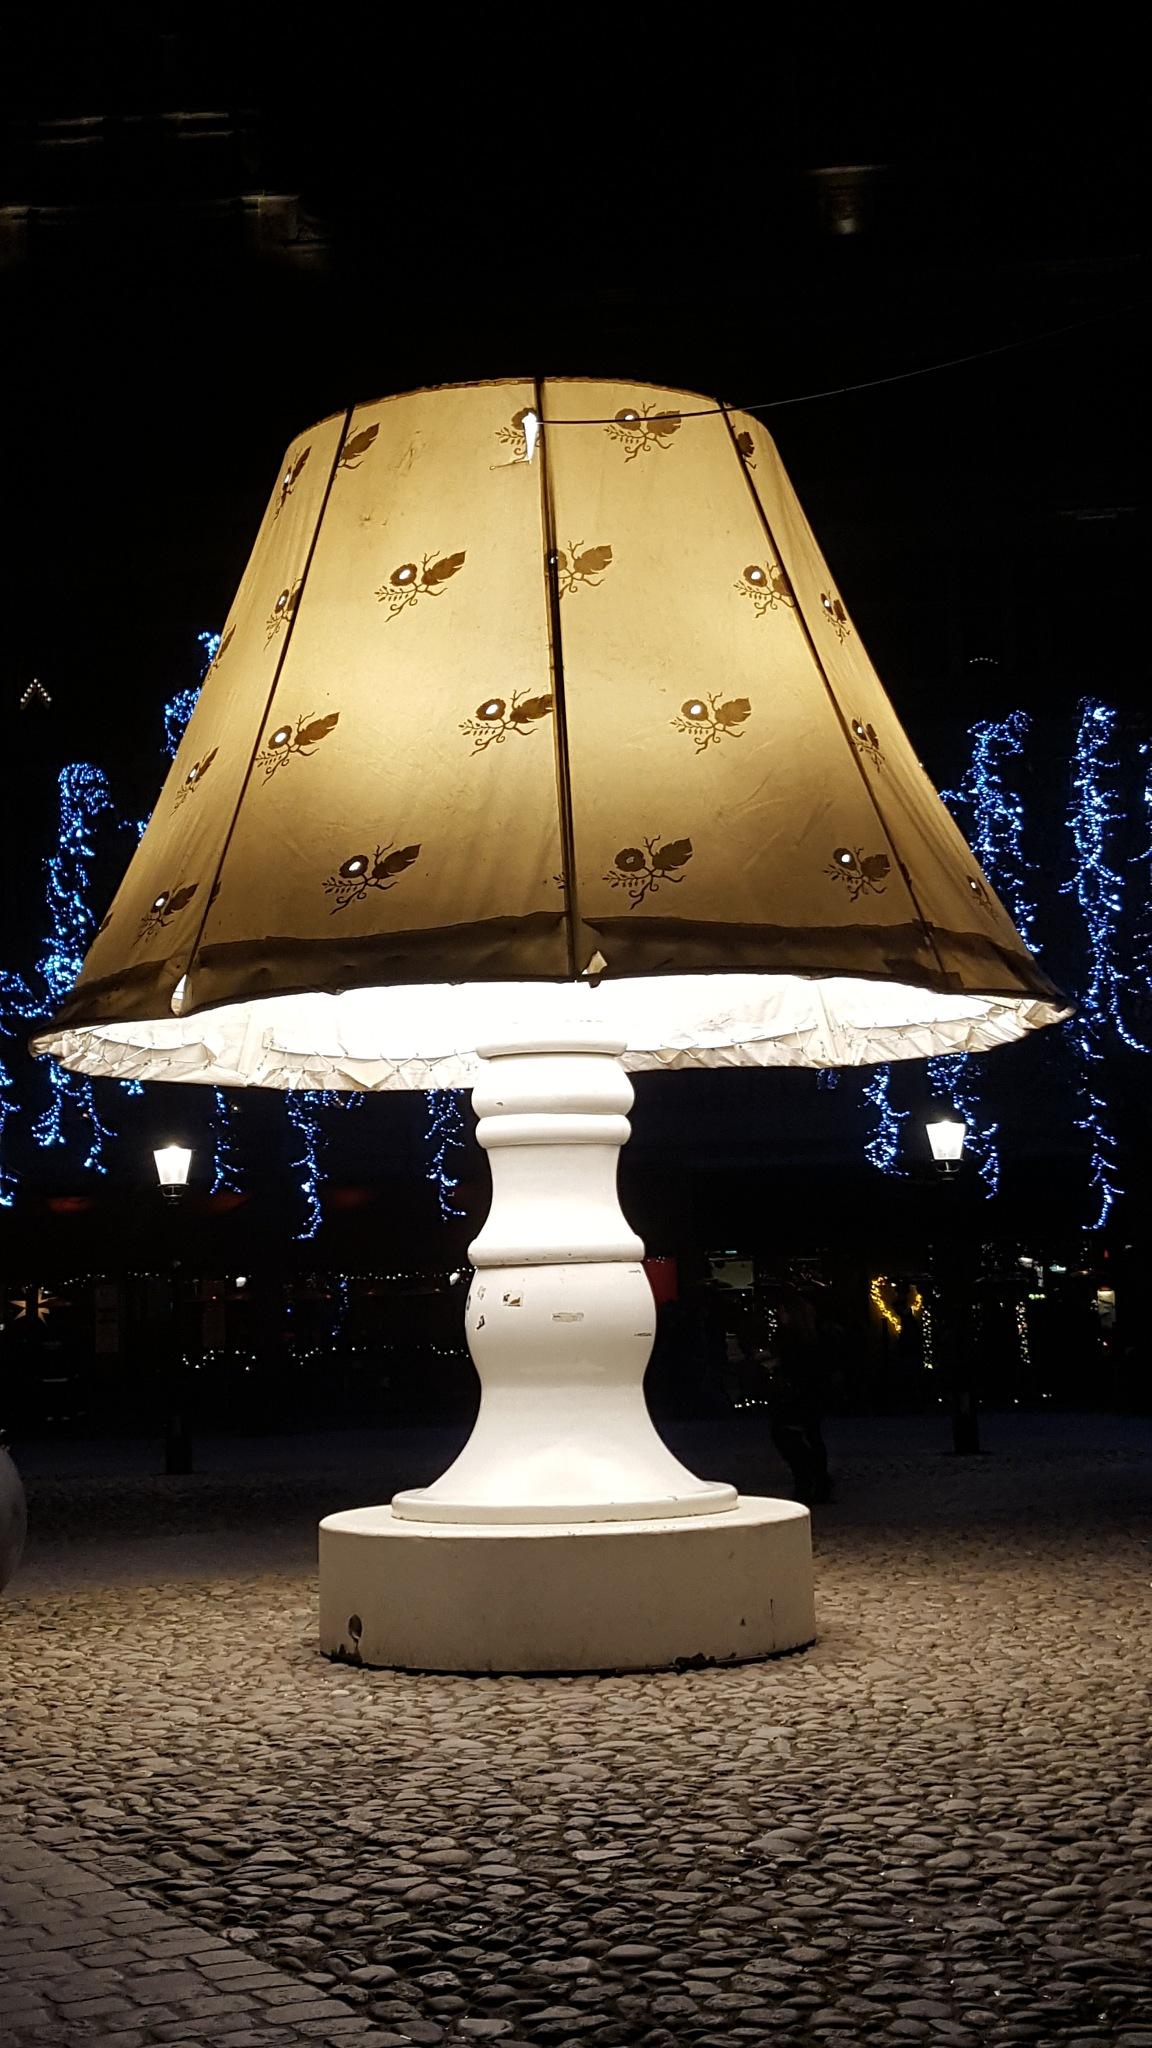 The Lamp by Suzi